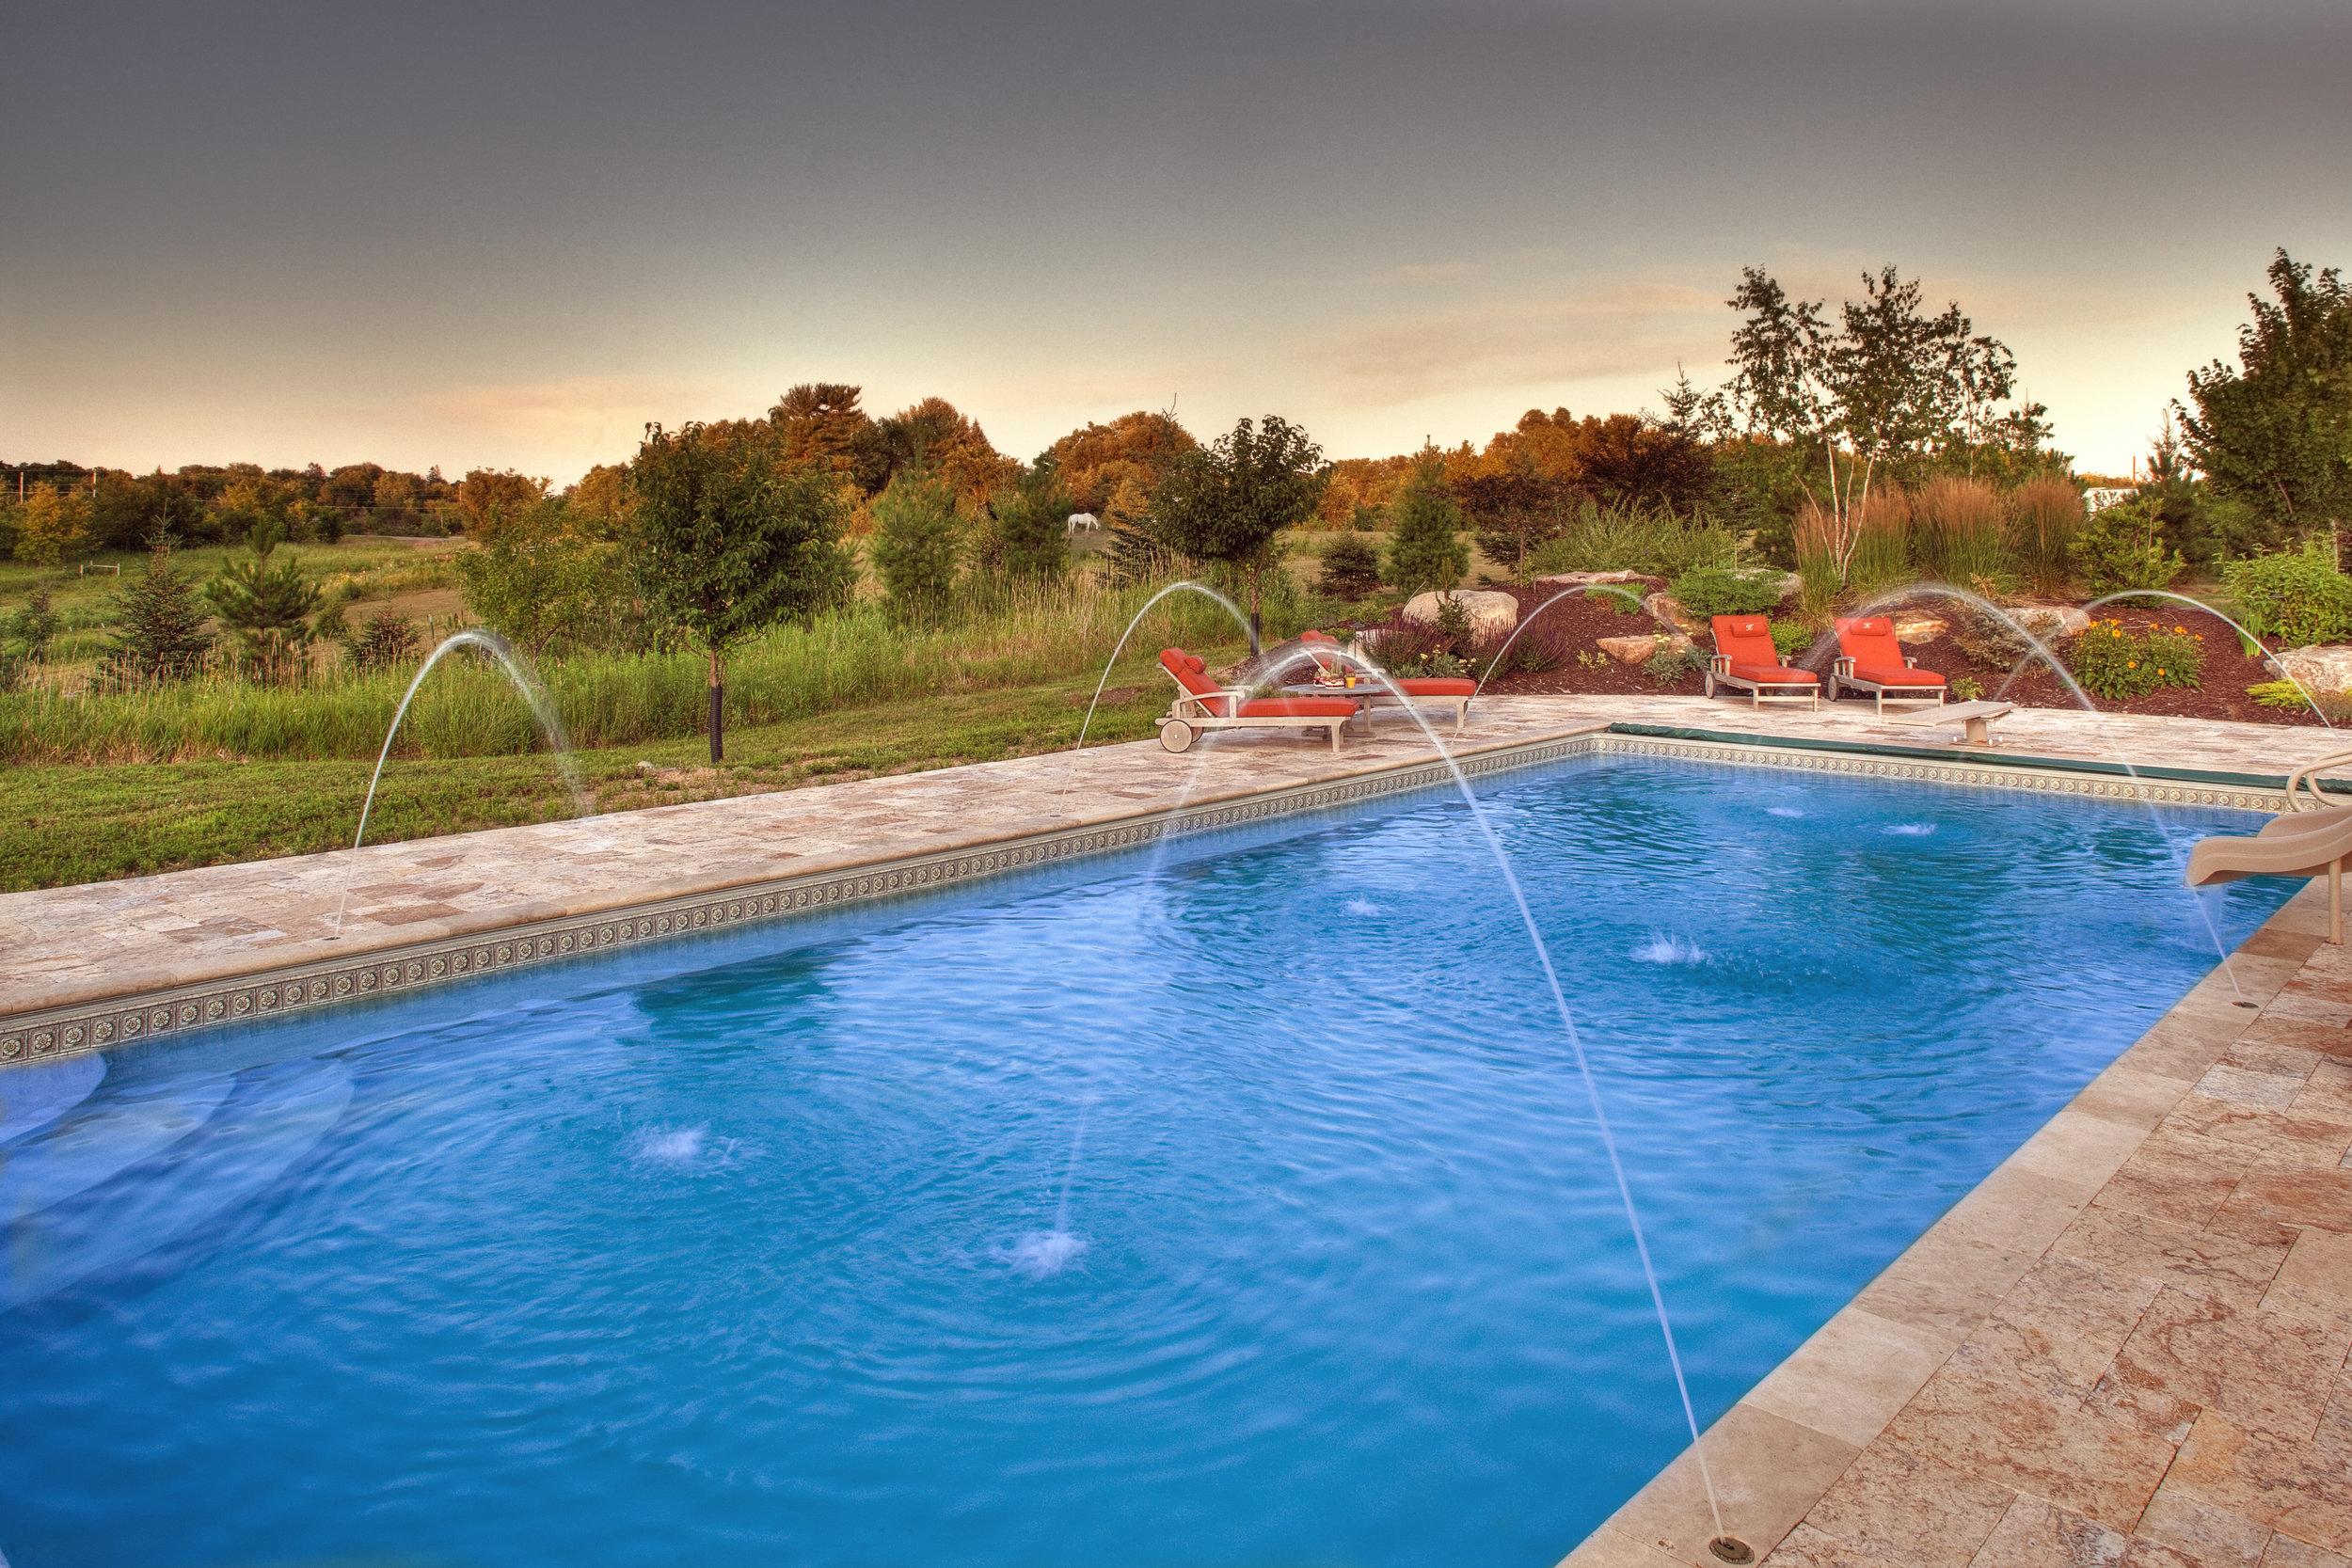 tabor-pool-landscape.jpg